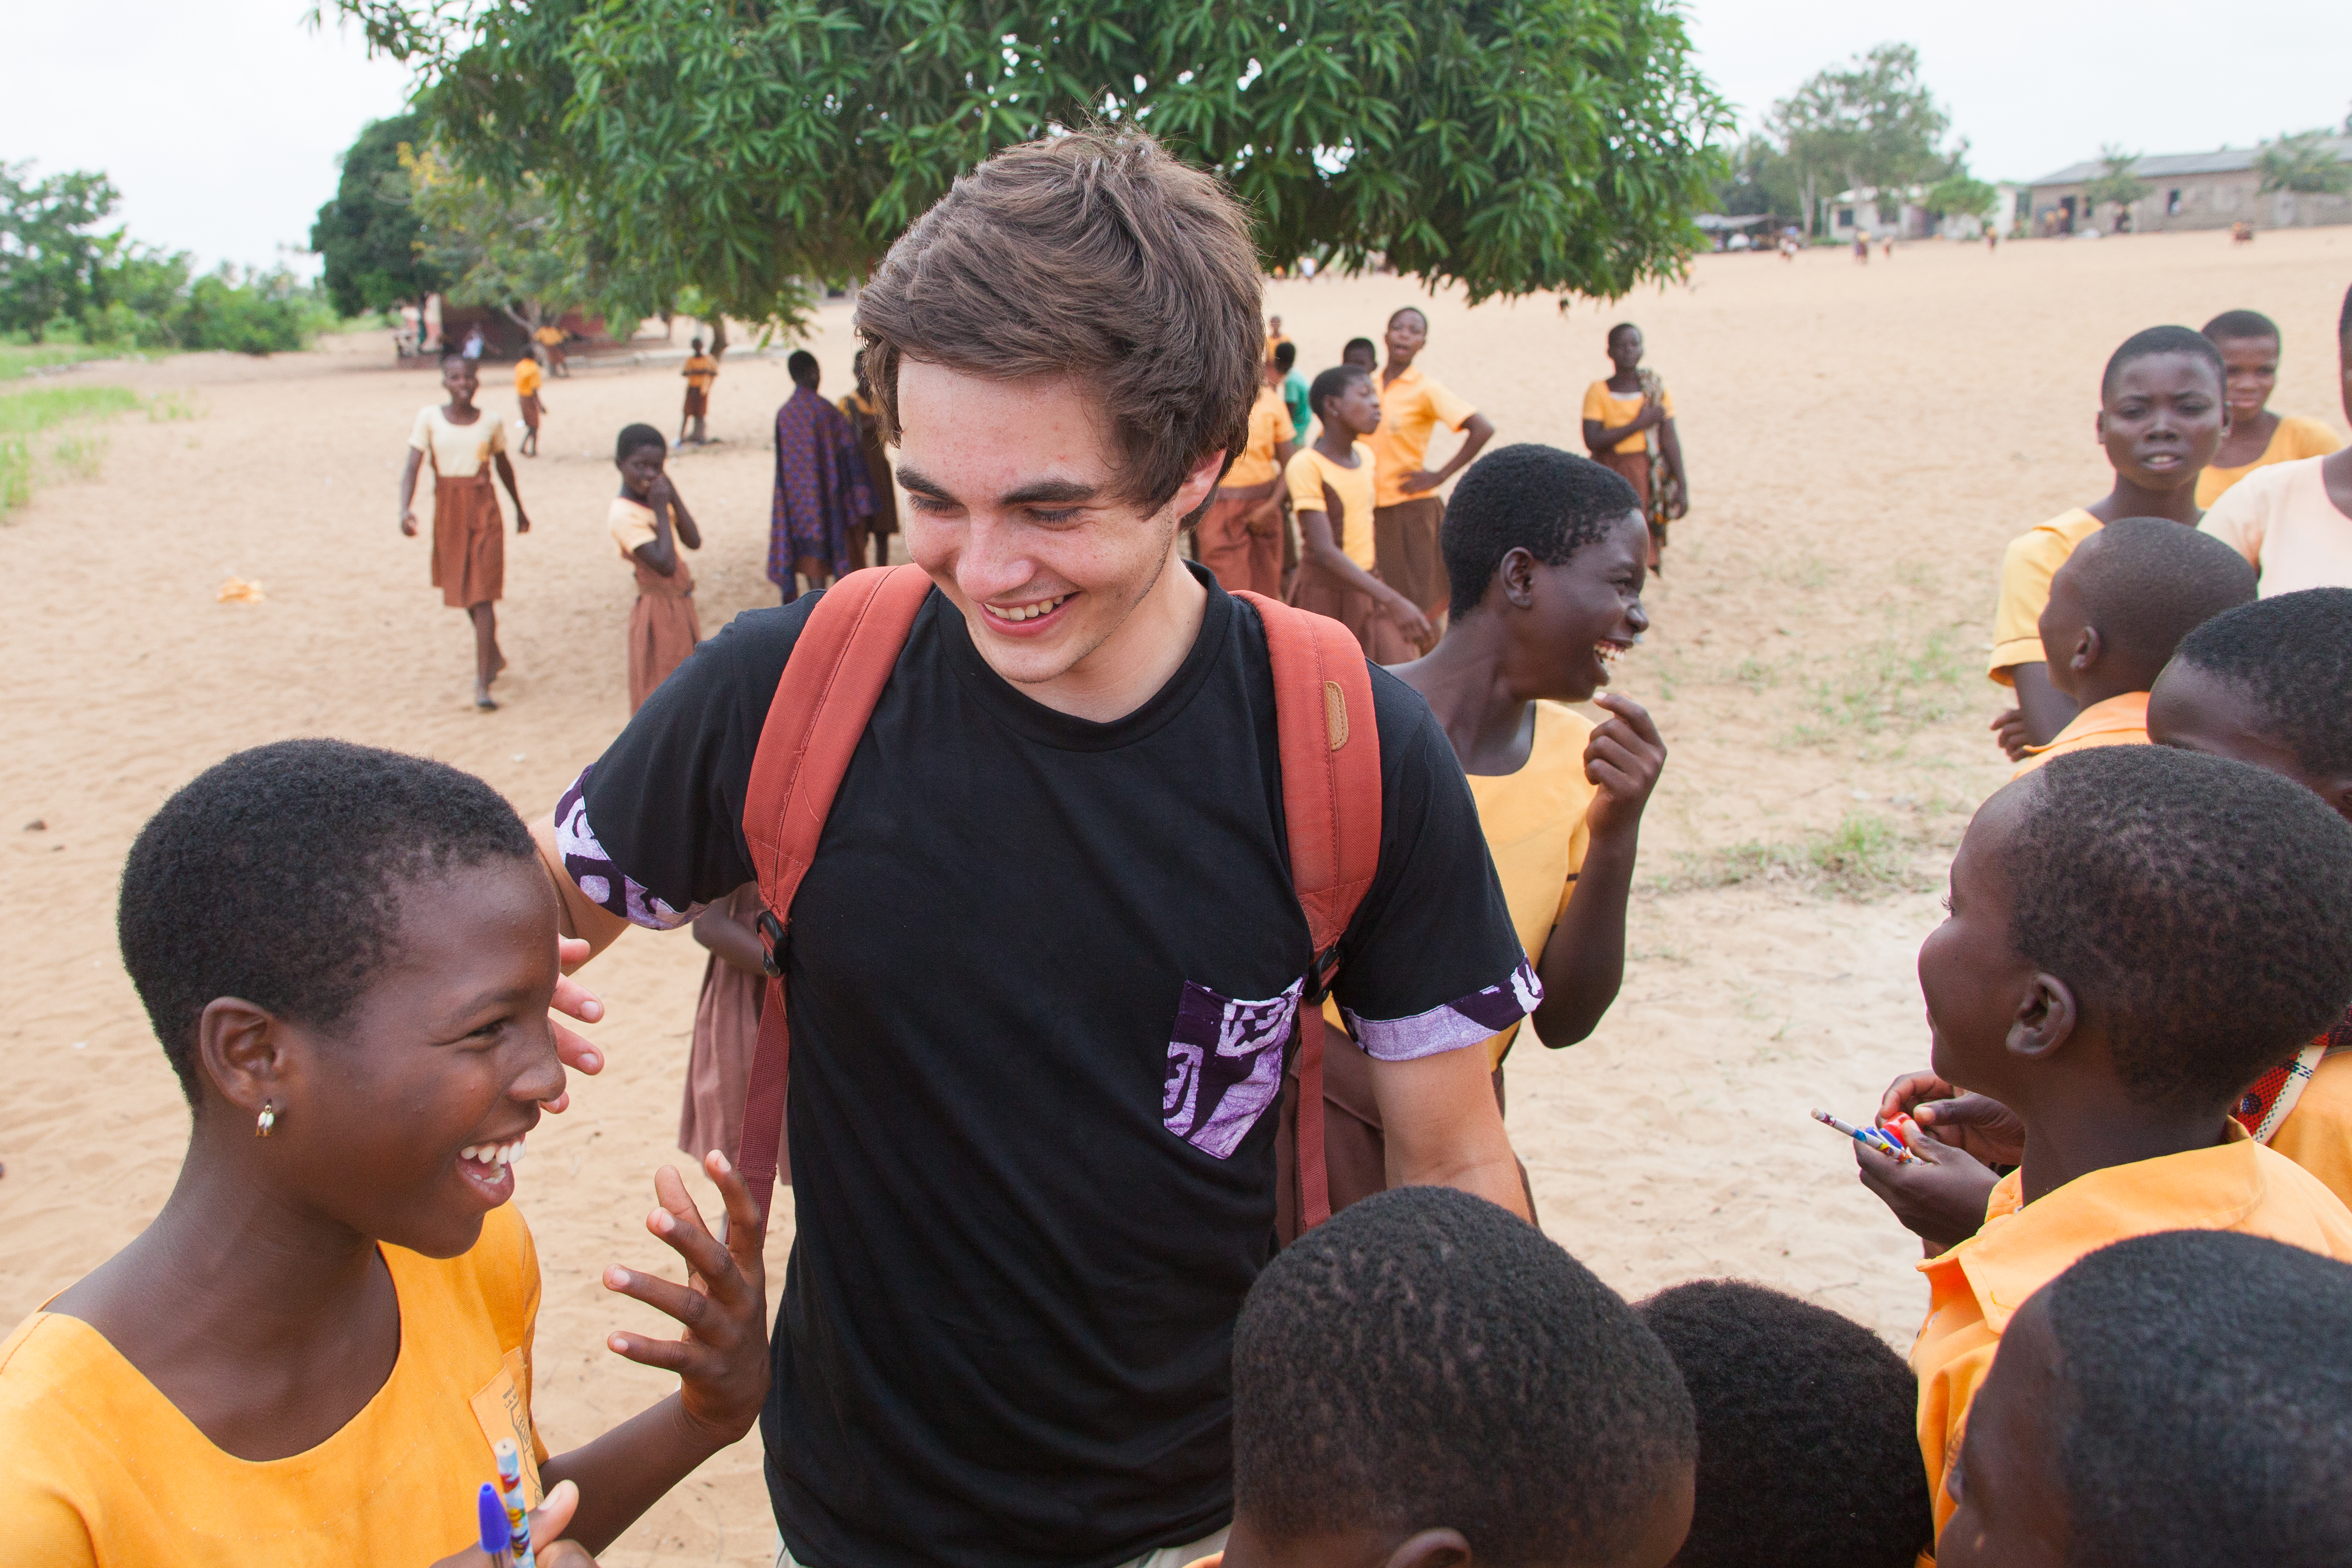 Summer Program - Adventure/Trips | Global Leadership Adventures: Ghana - Children of Africa